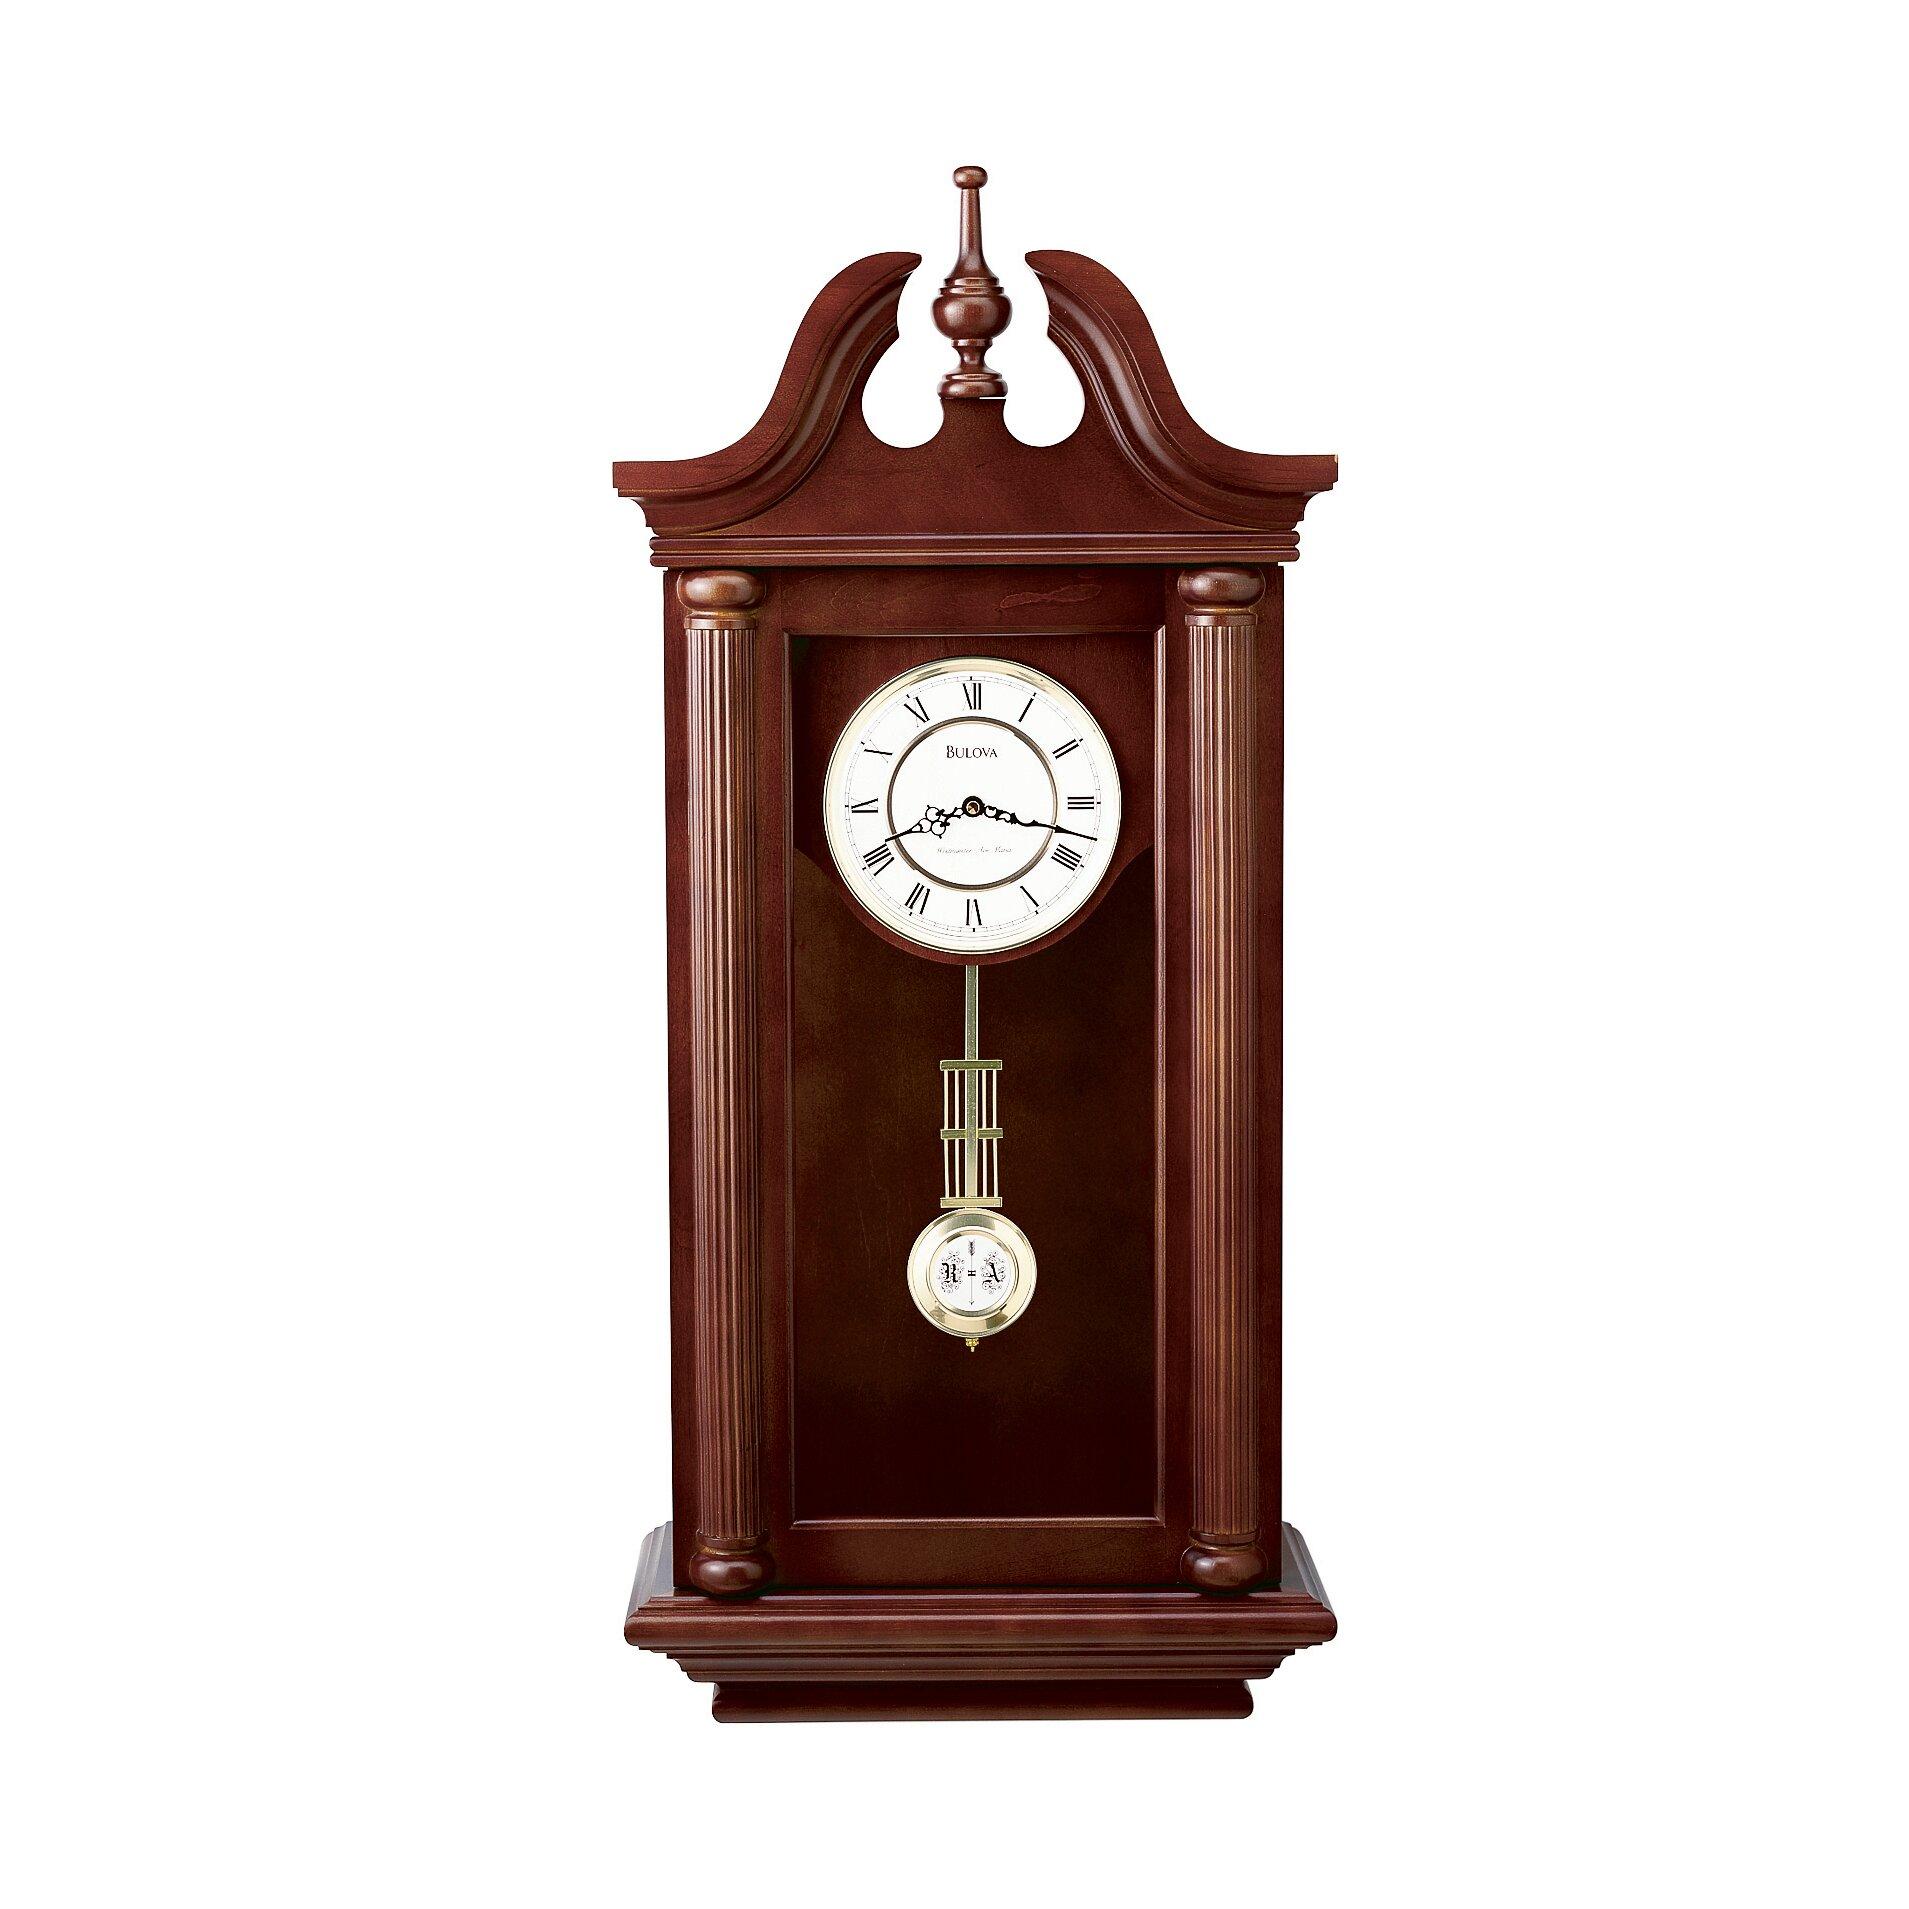 bulova manchester pendulum wall clock reviews wayfair